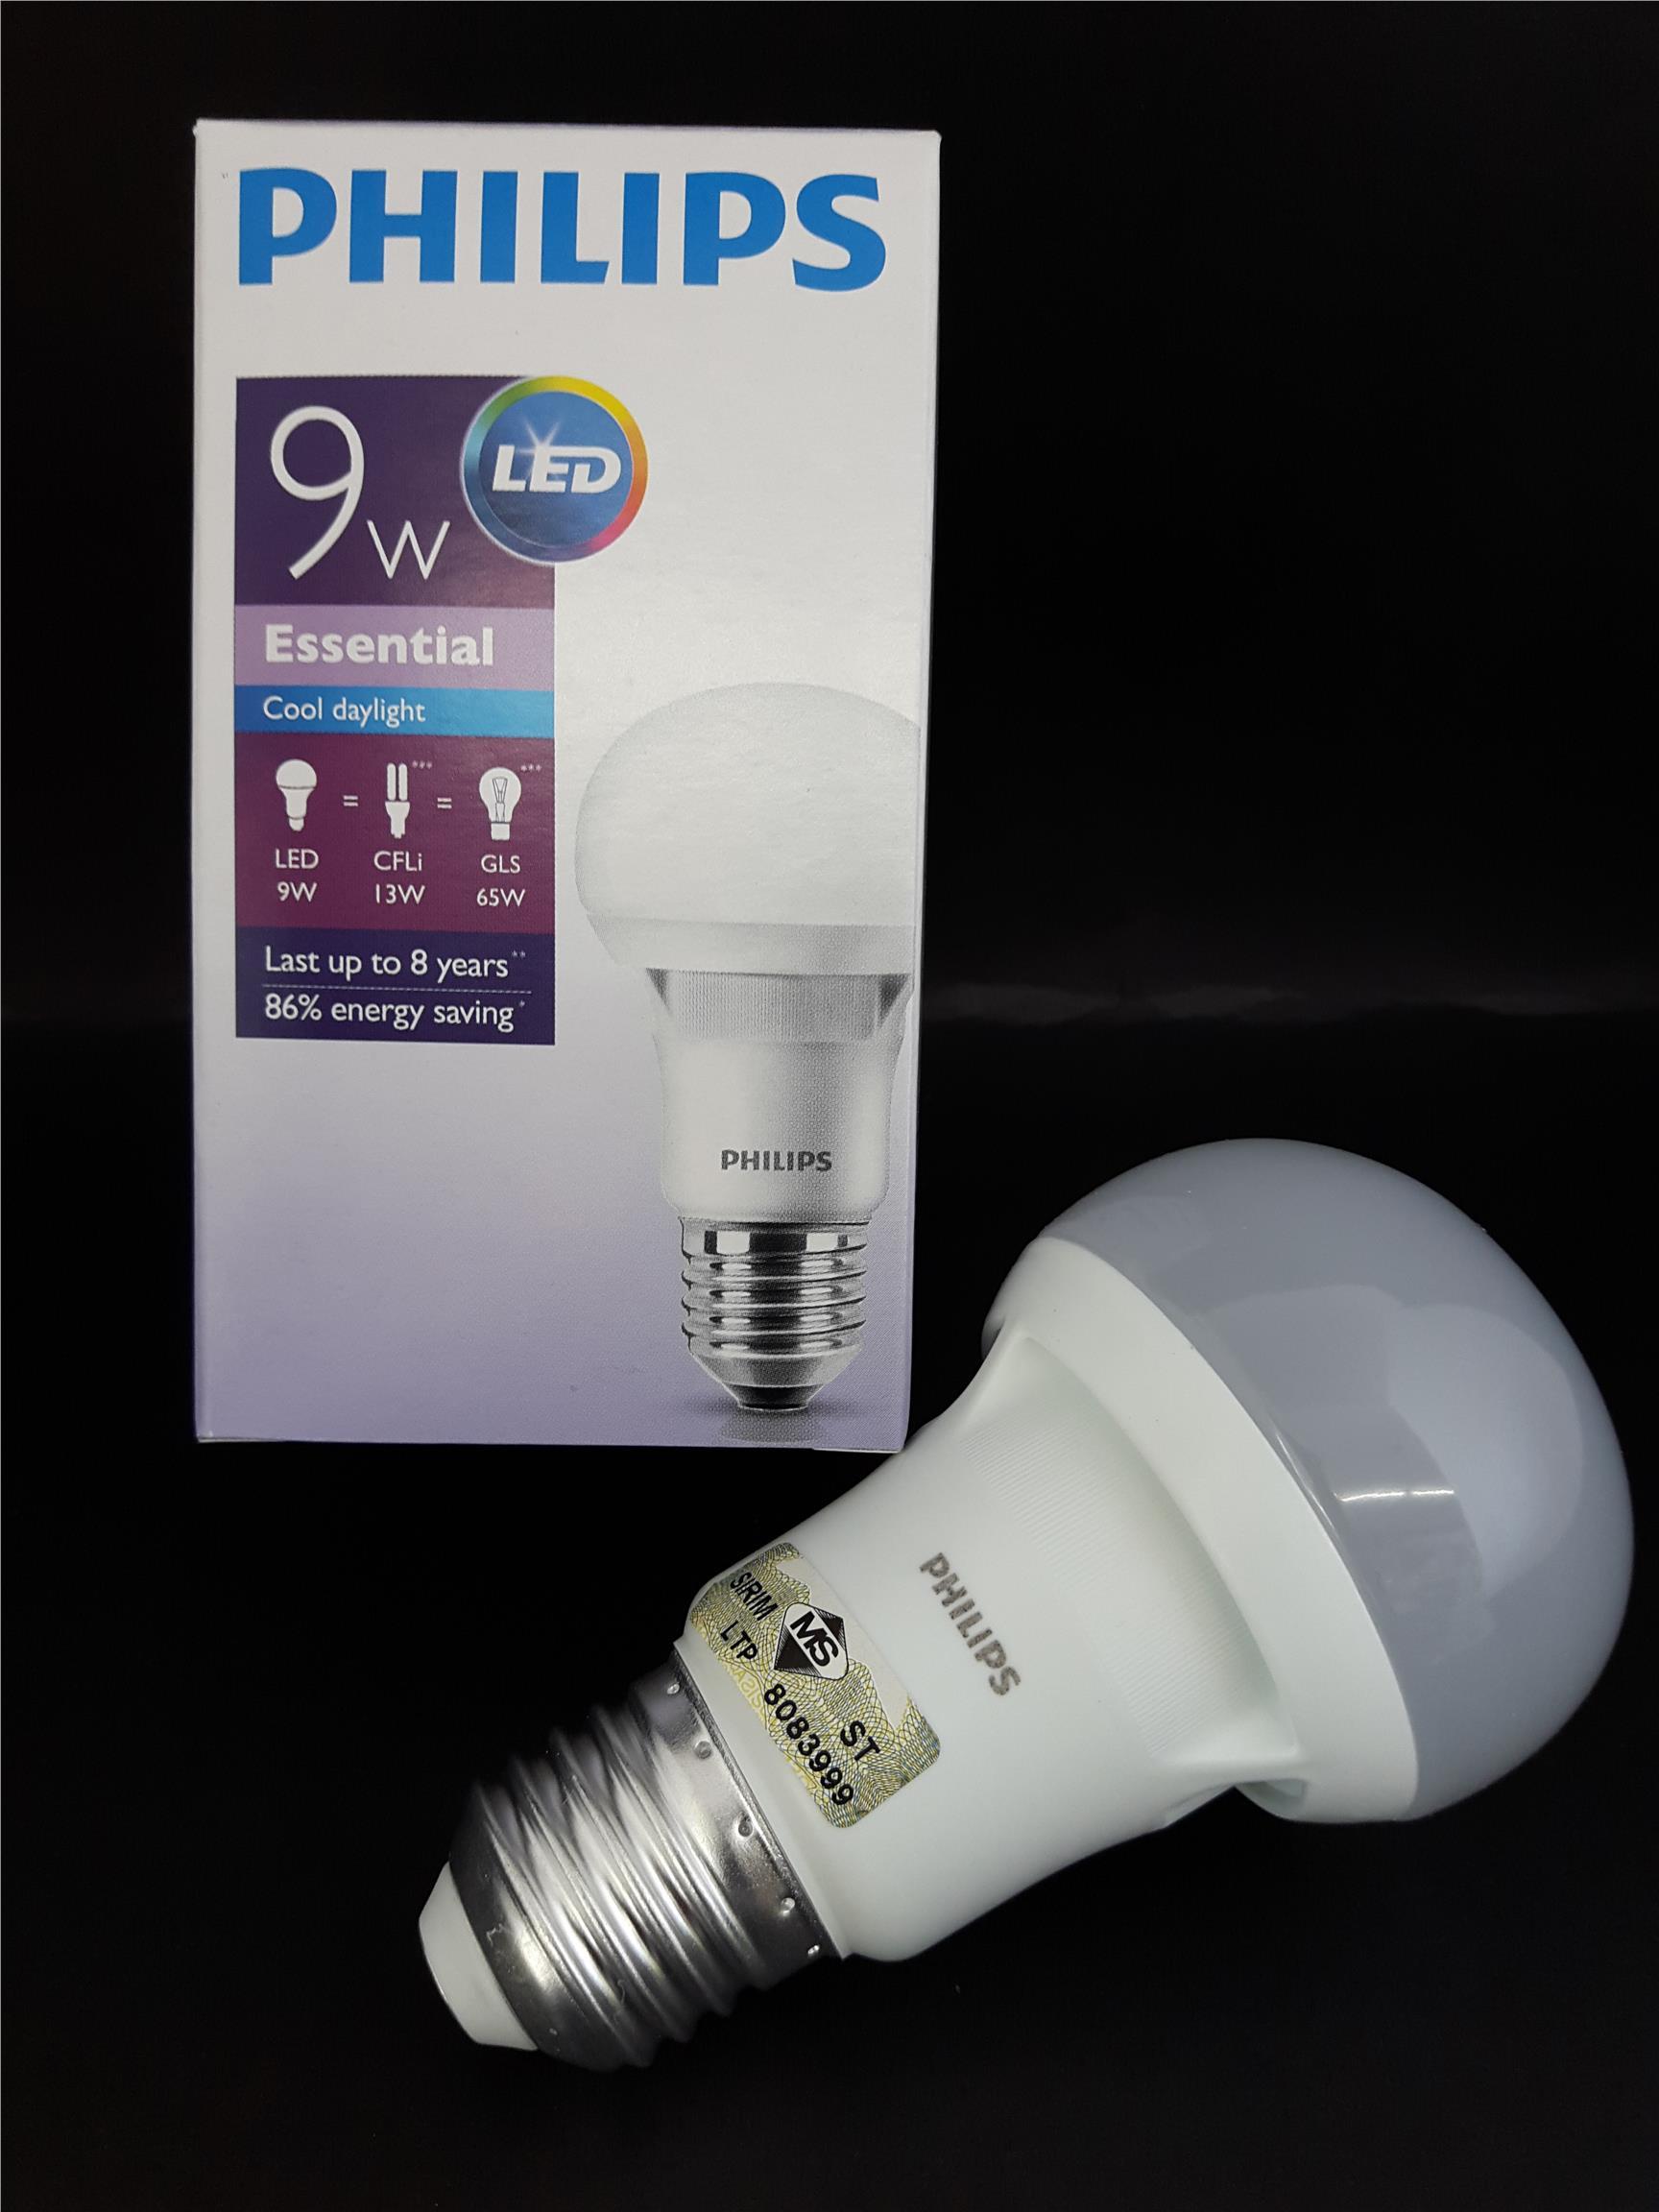 philips 9w essential led bulb e27 6 end 5 13 2017 11 15 pm. Black Bedroom Furniture Sets. Home Design Ideas